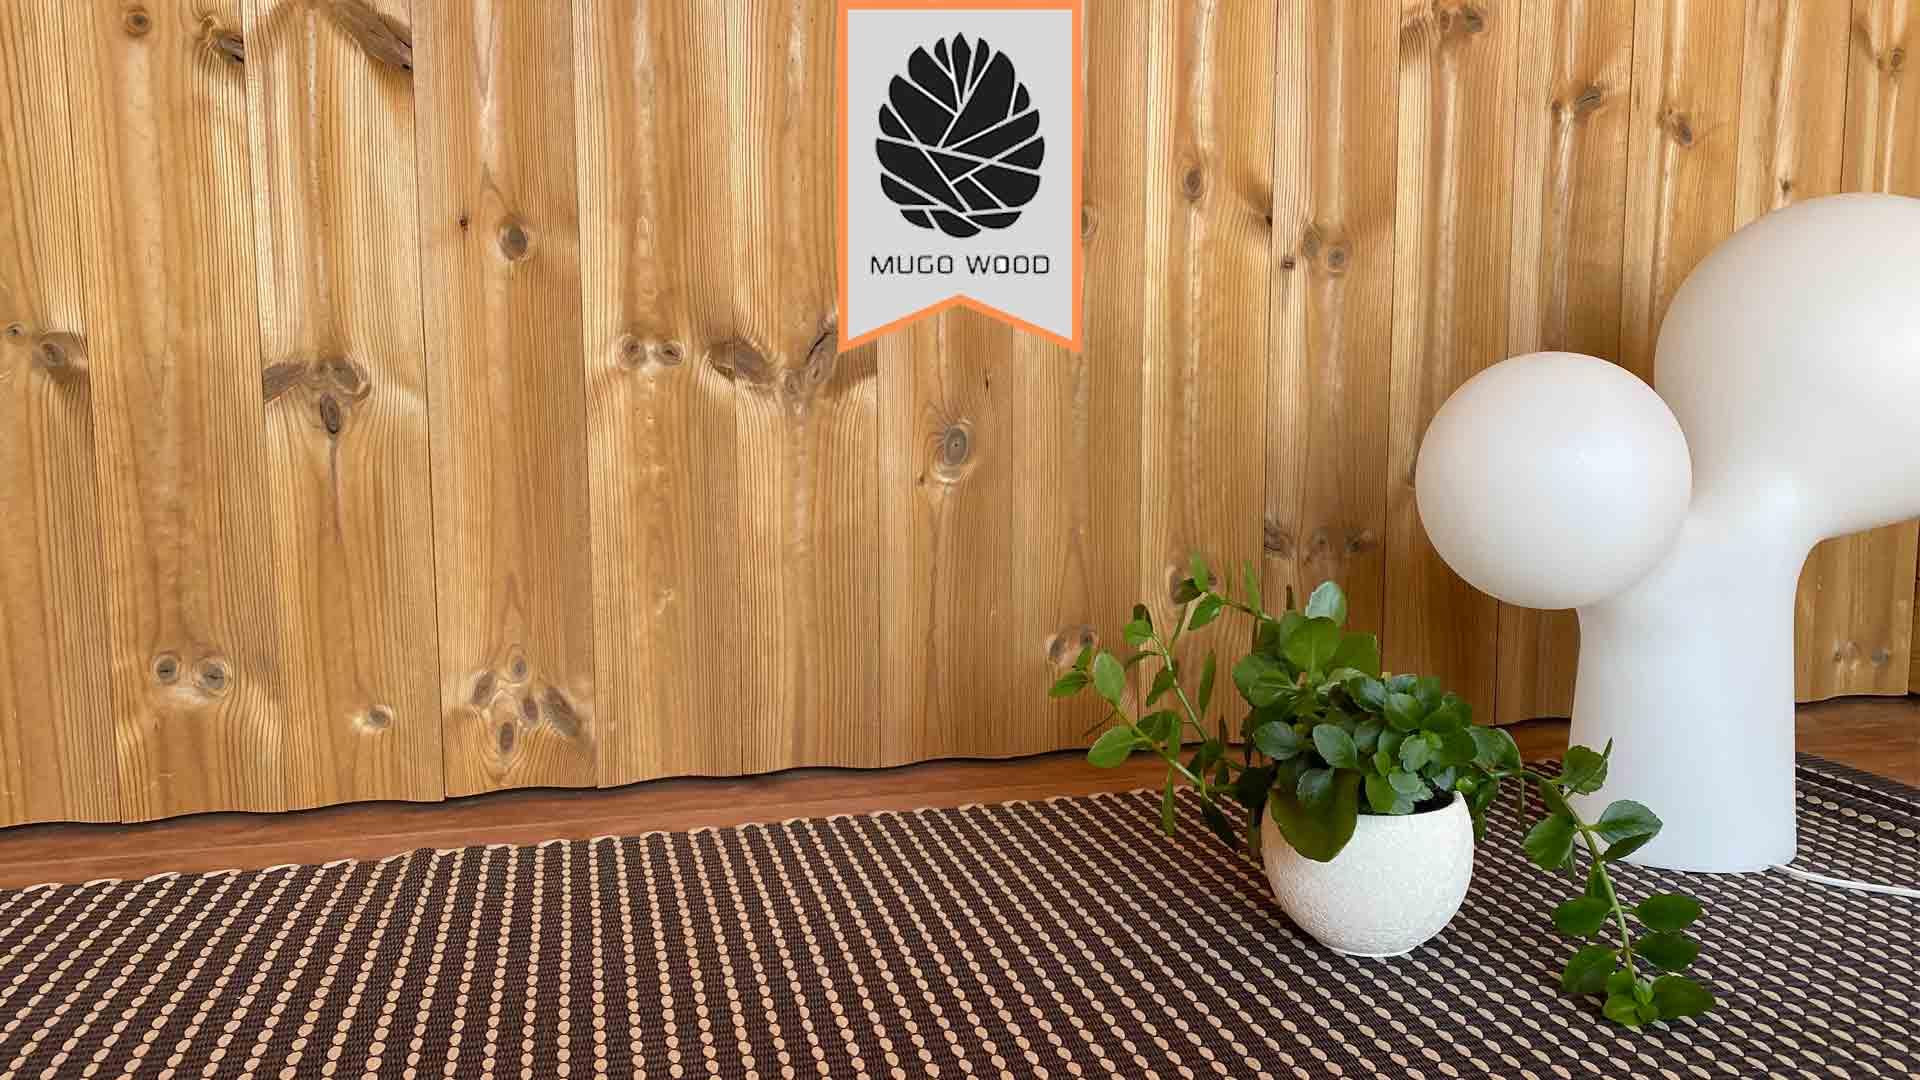 قیمت هر متر مربع چوب ترمو | موگو وود | قیمت ترموود | قیمت چوب ترمو | چوب ترمو چیست |